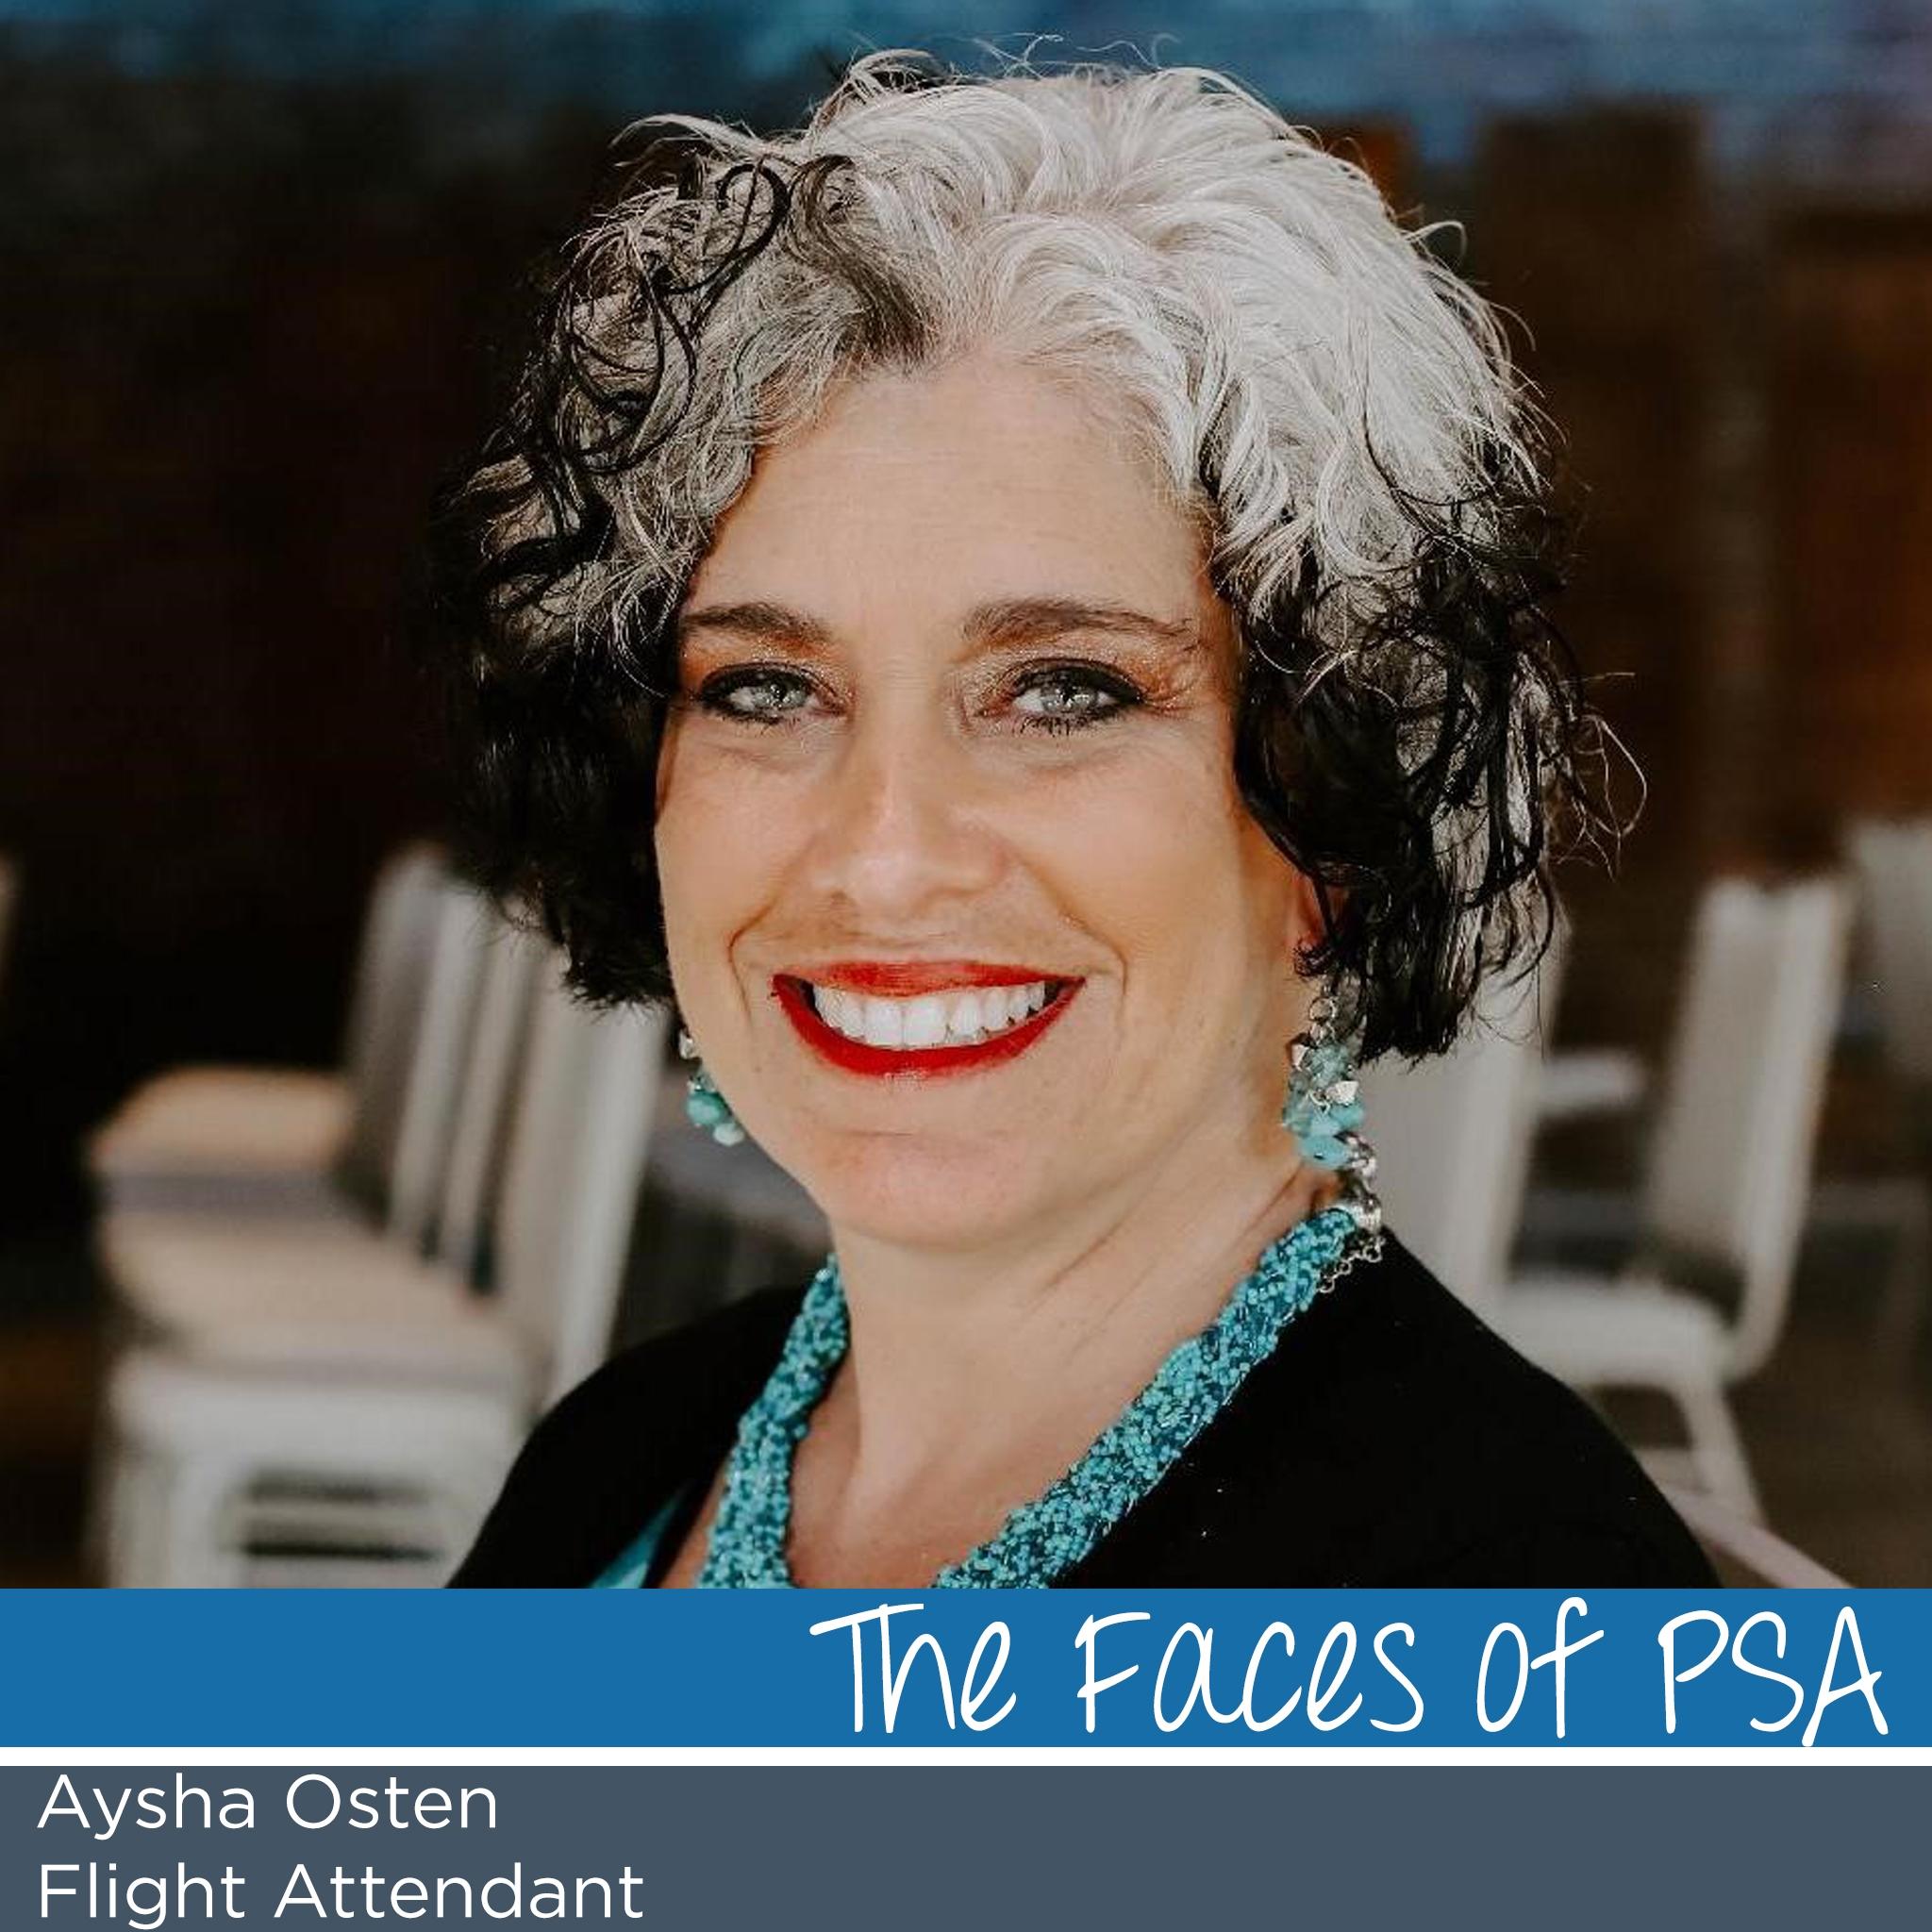 Flight Attendant and Recruiting Ambassador, Aysha Osten